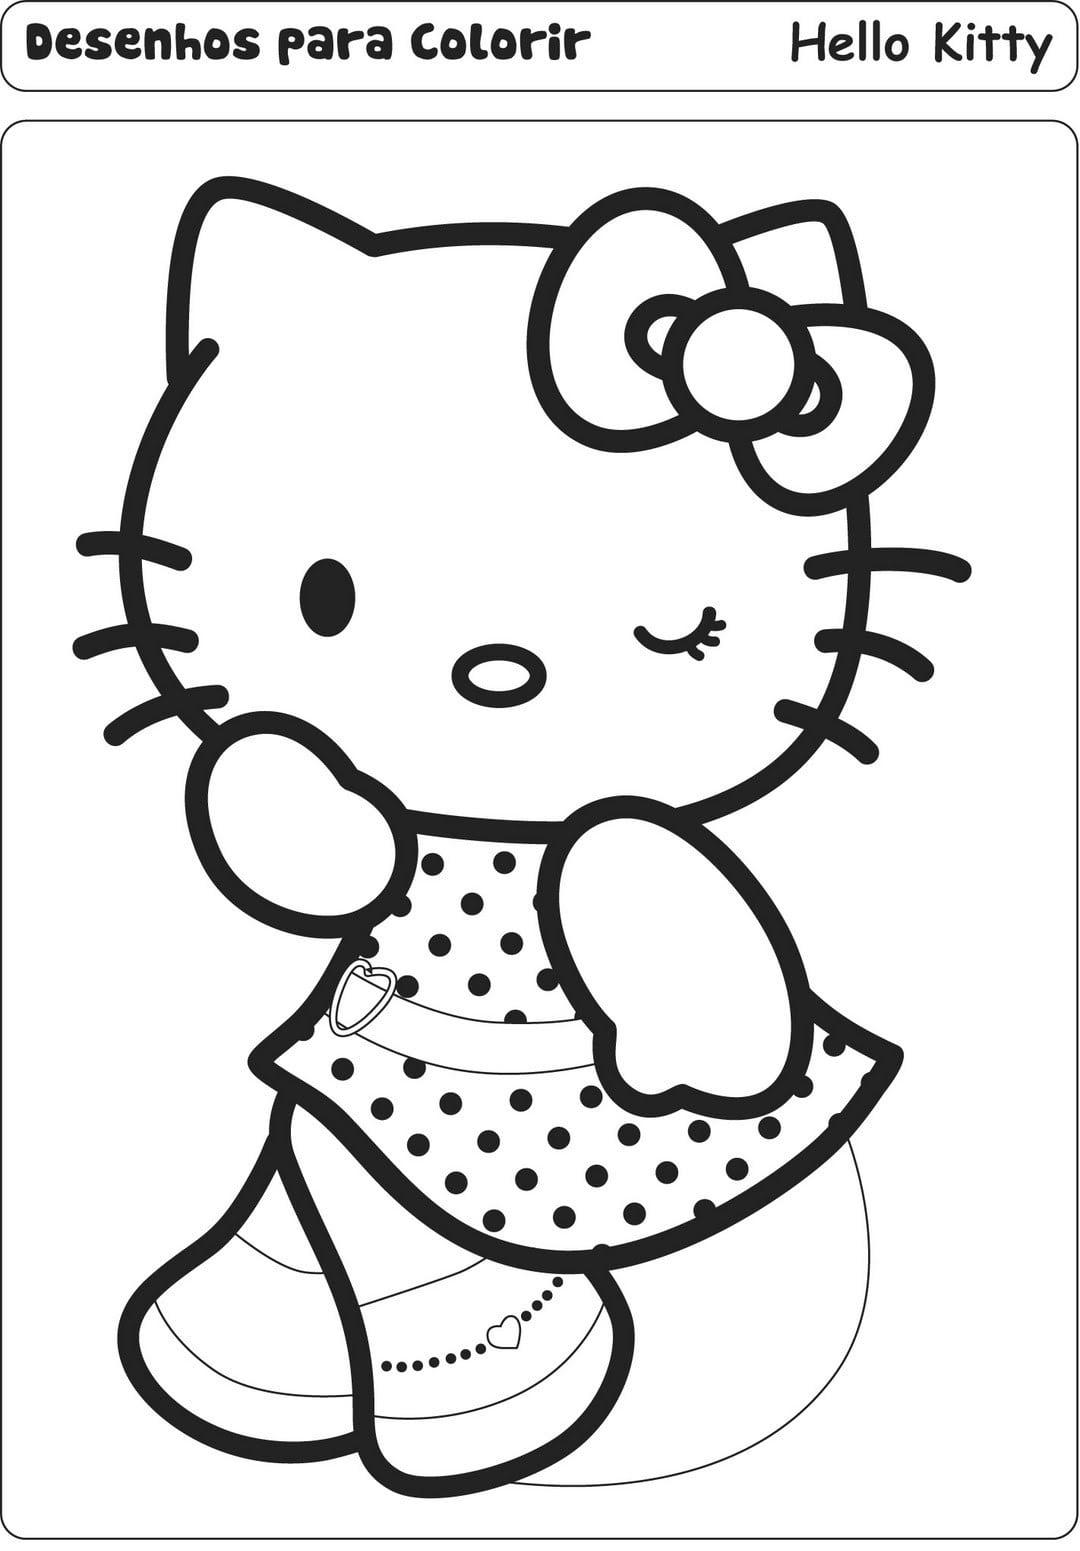 Hello Kitty Desenhos